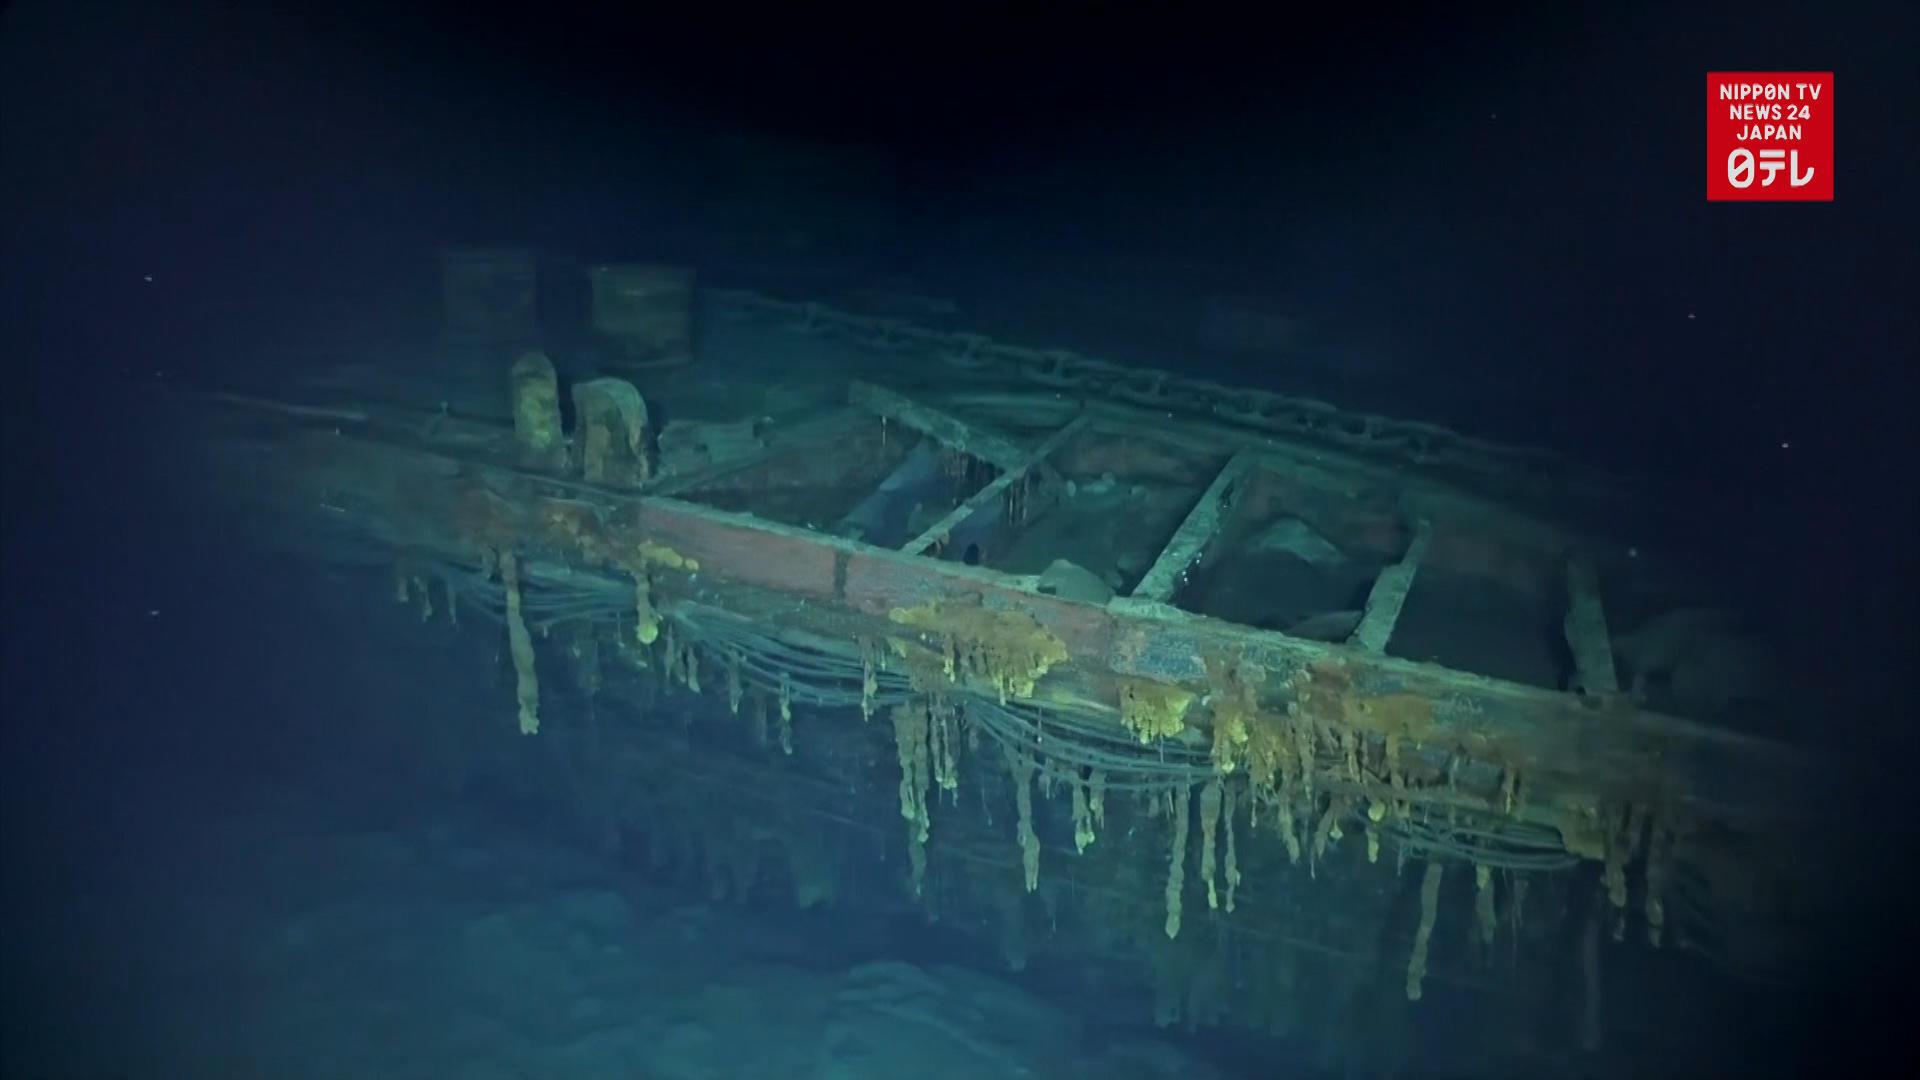 Sunken Japanese WWII ship Akagi found